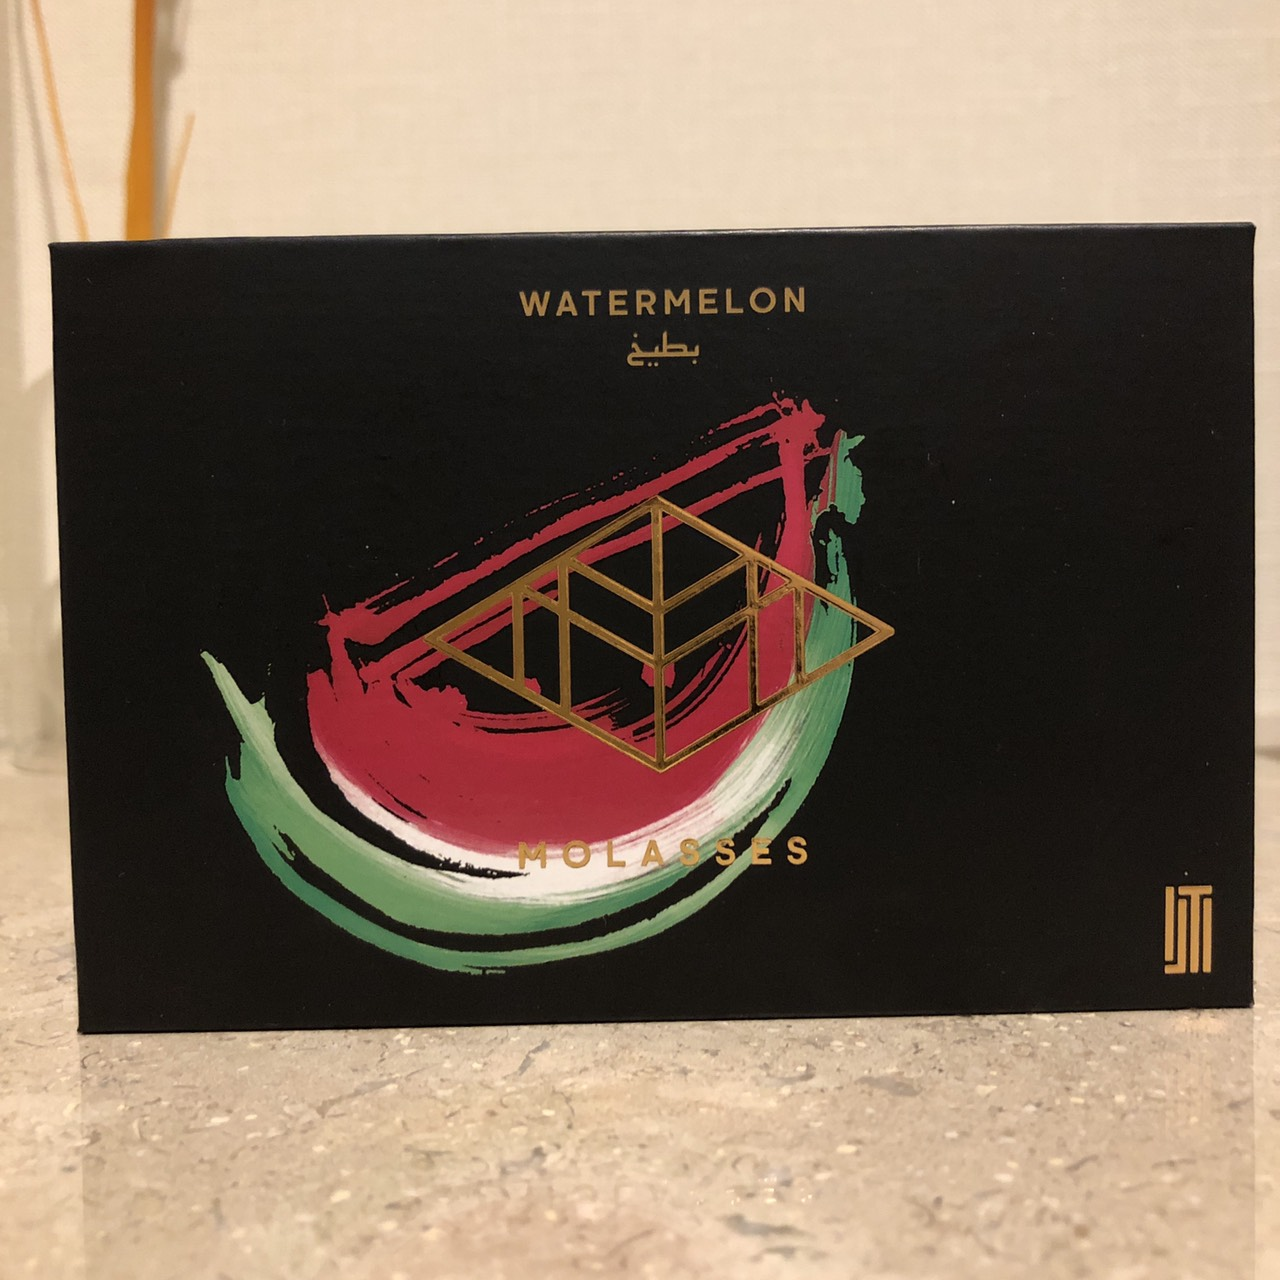 MALAKI / Watermelon(良い意味でスカスカした甘さと、やや強めのウリ臭さによるキレ感が特徴)